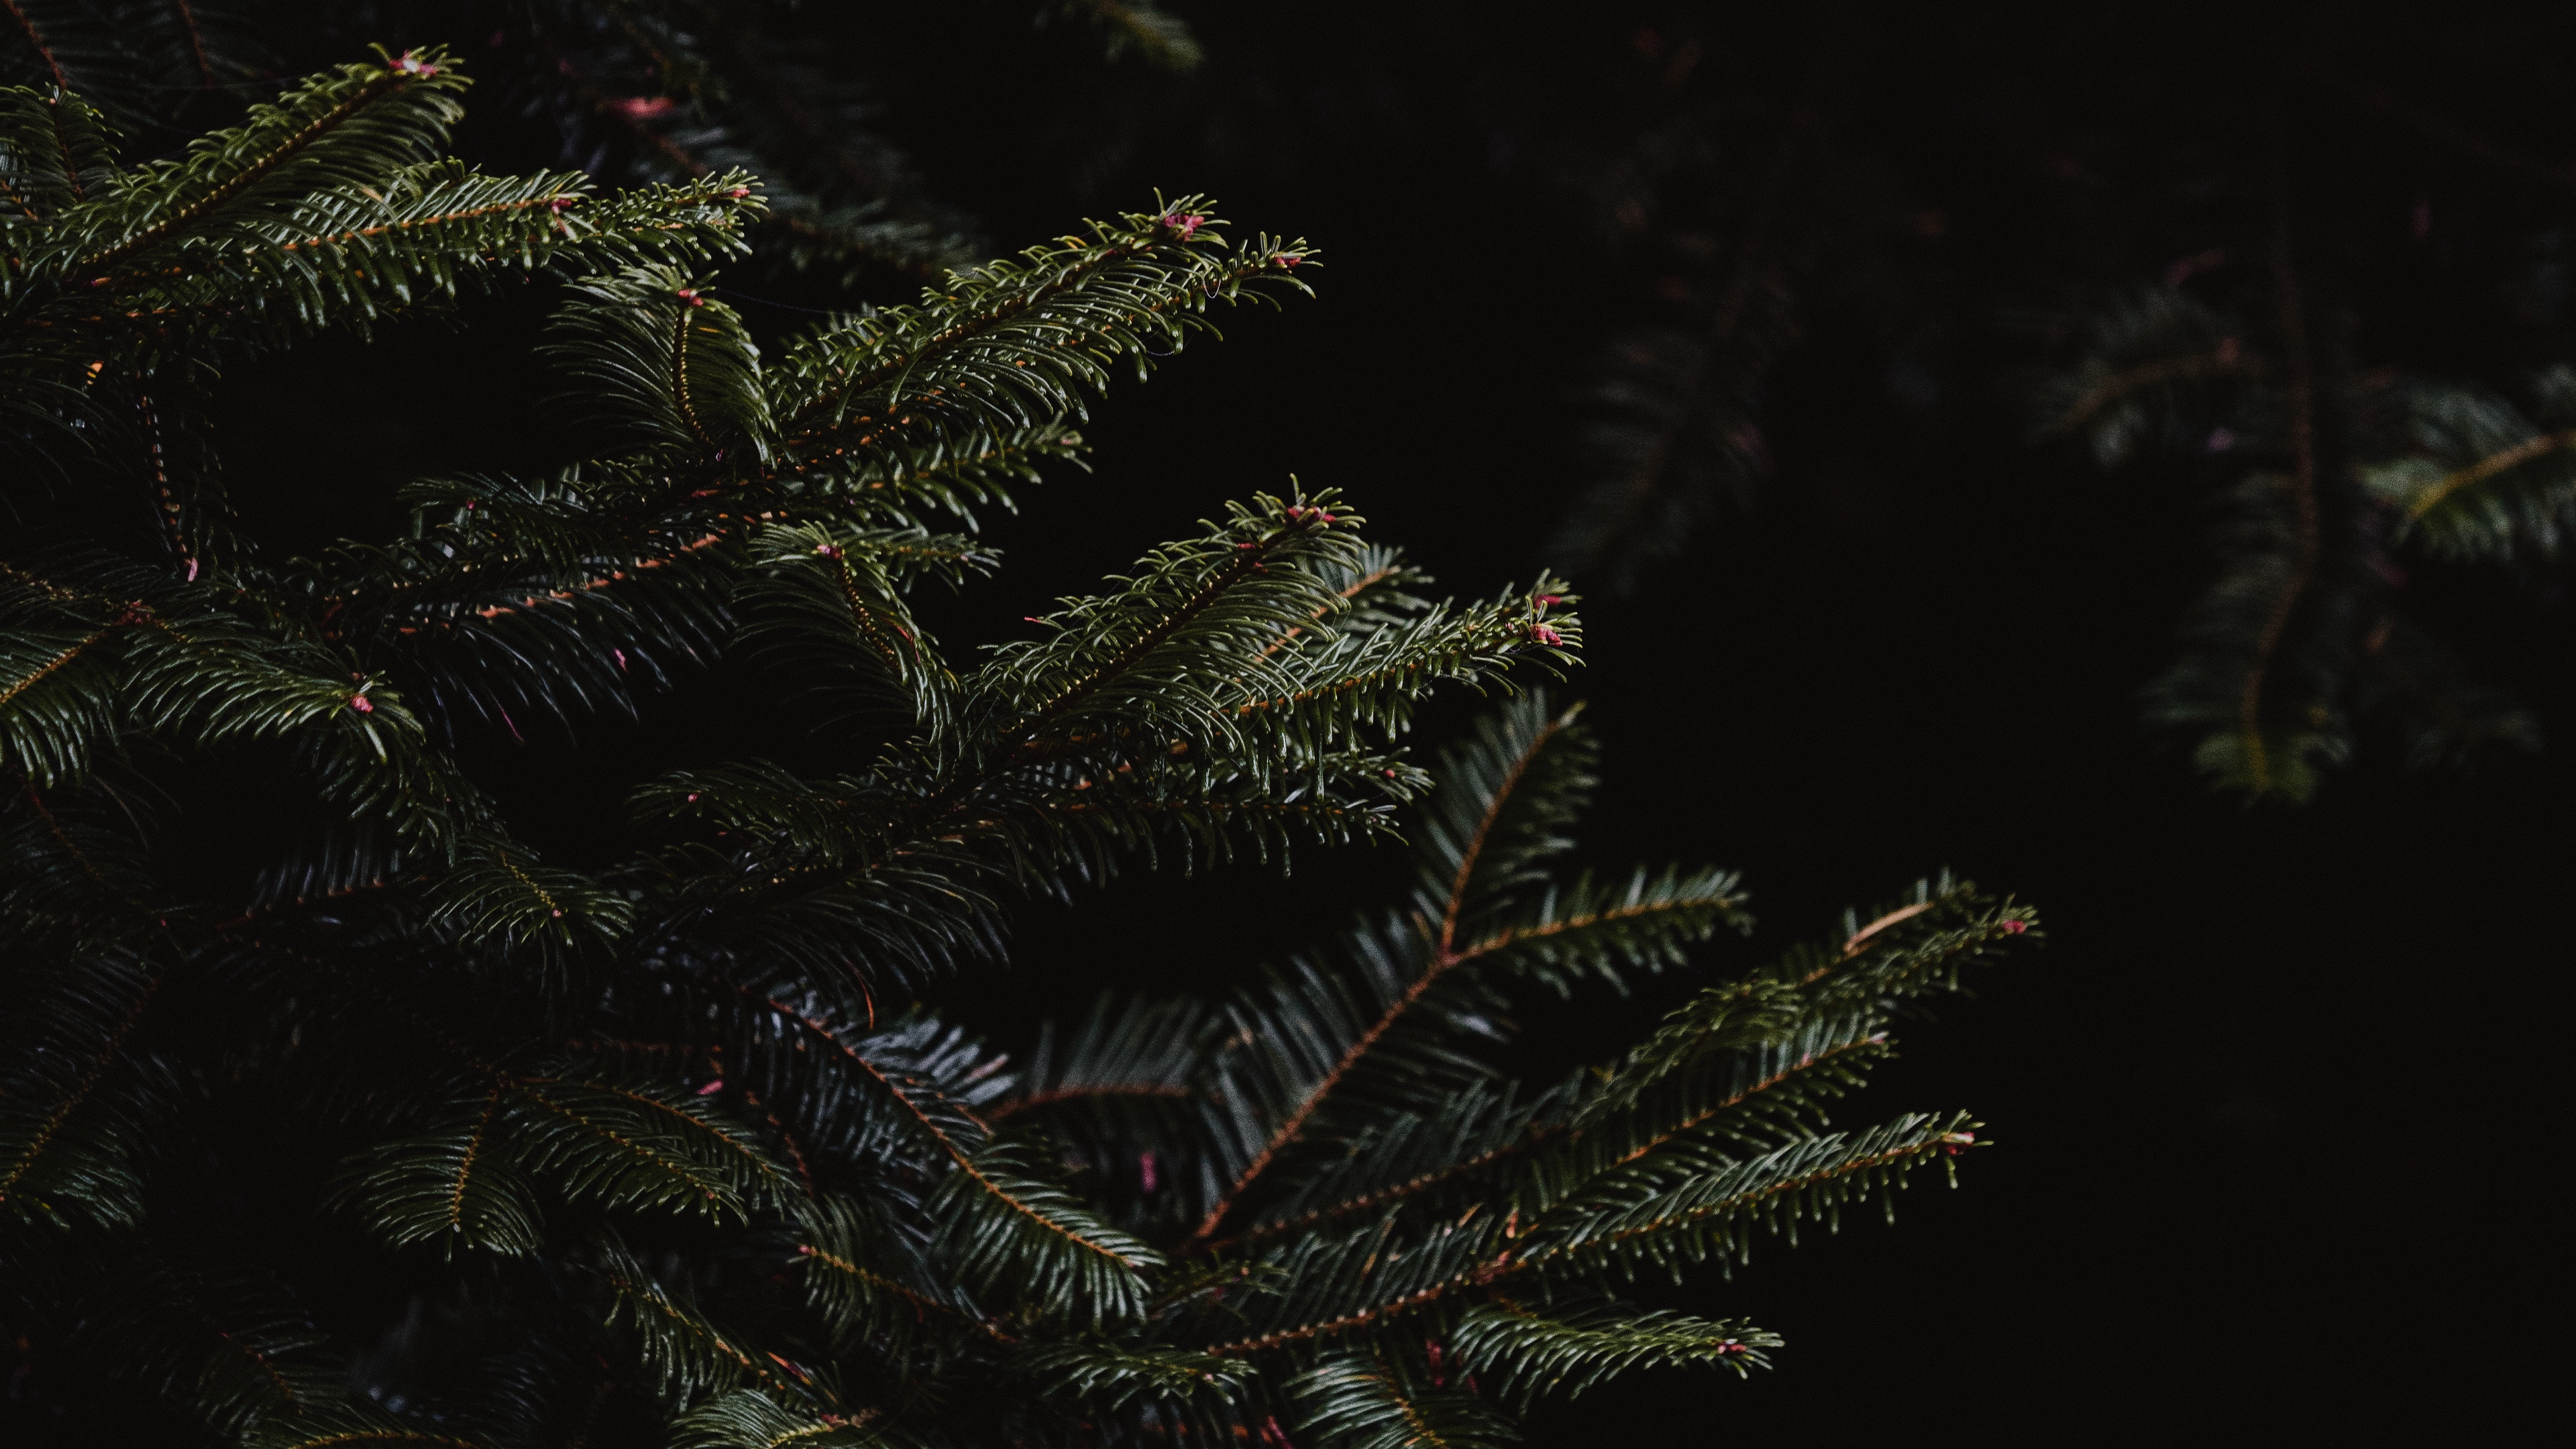 spruce branches dark needles 4k 1540575232 - spruce, branches, dark, needles 4k - spruce, Dark, branches